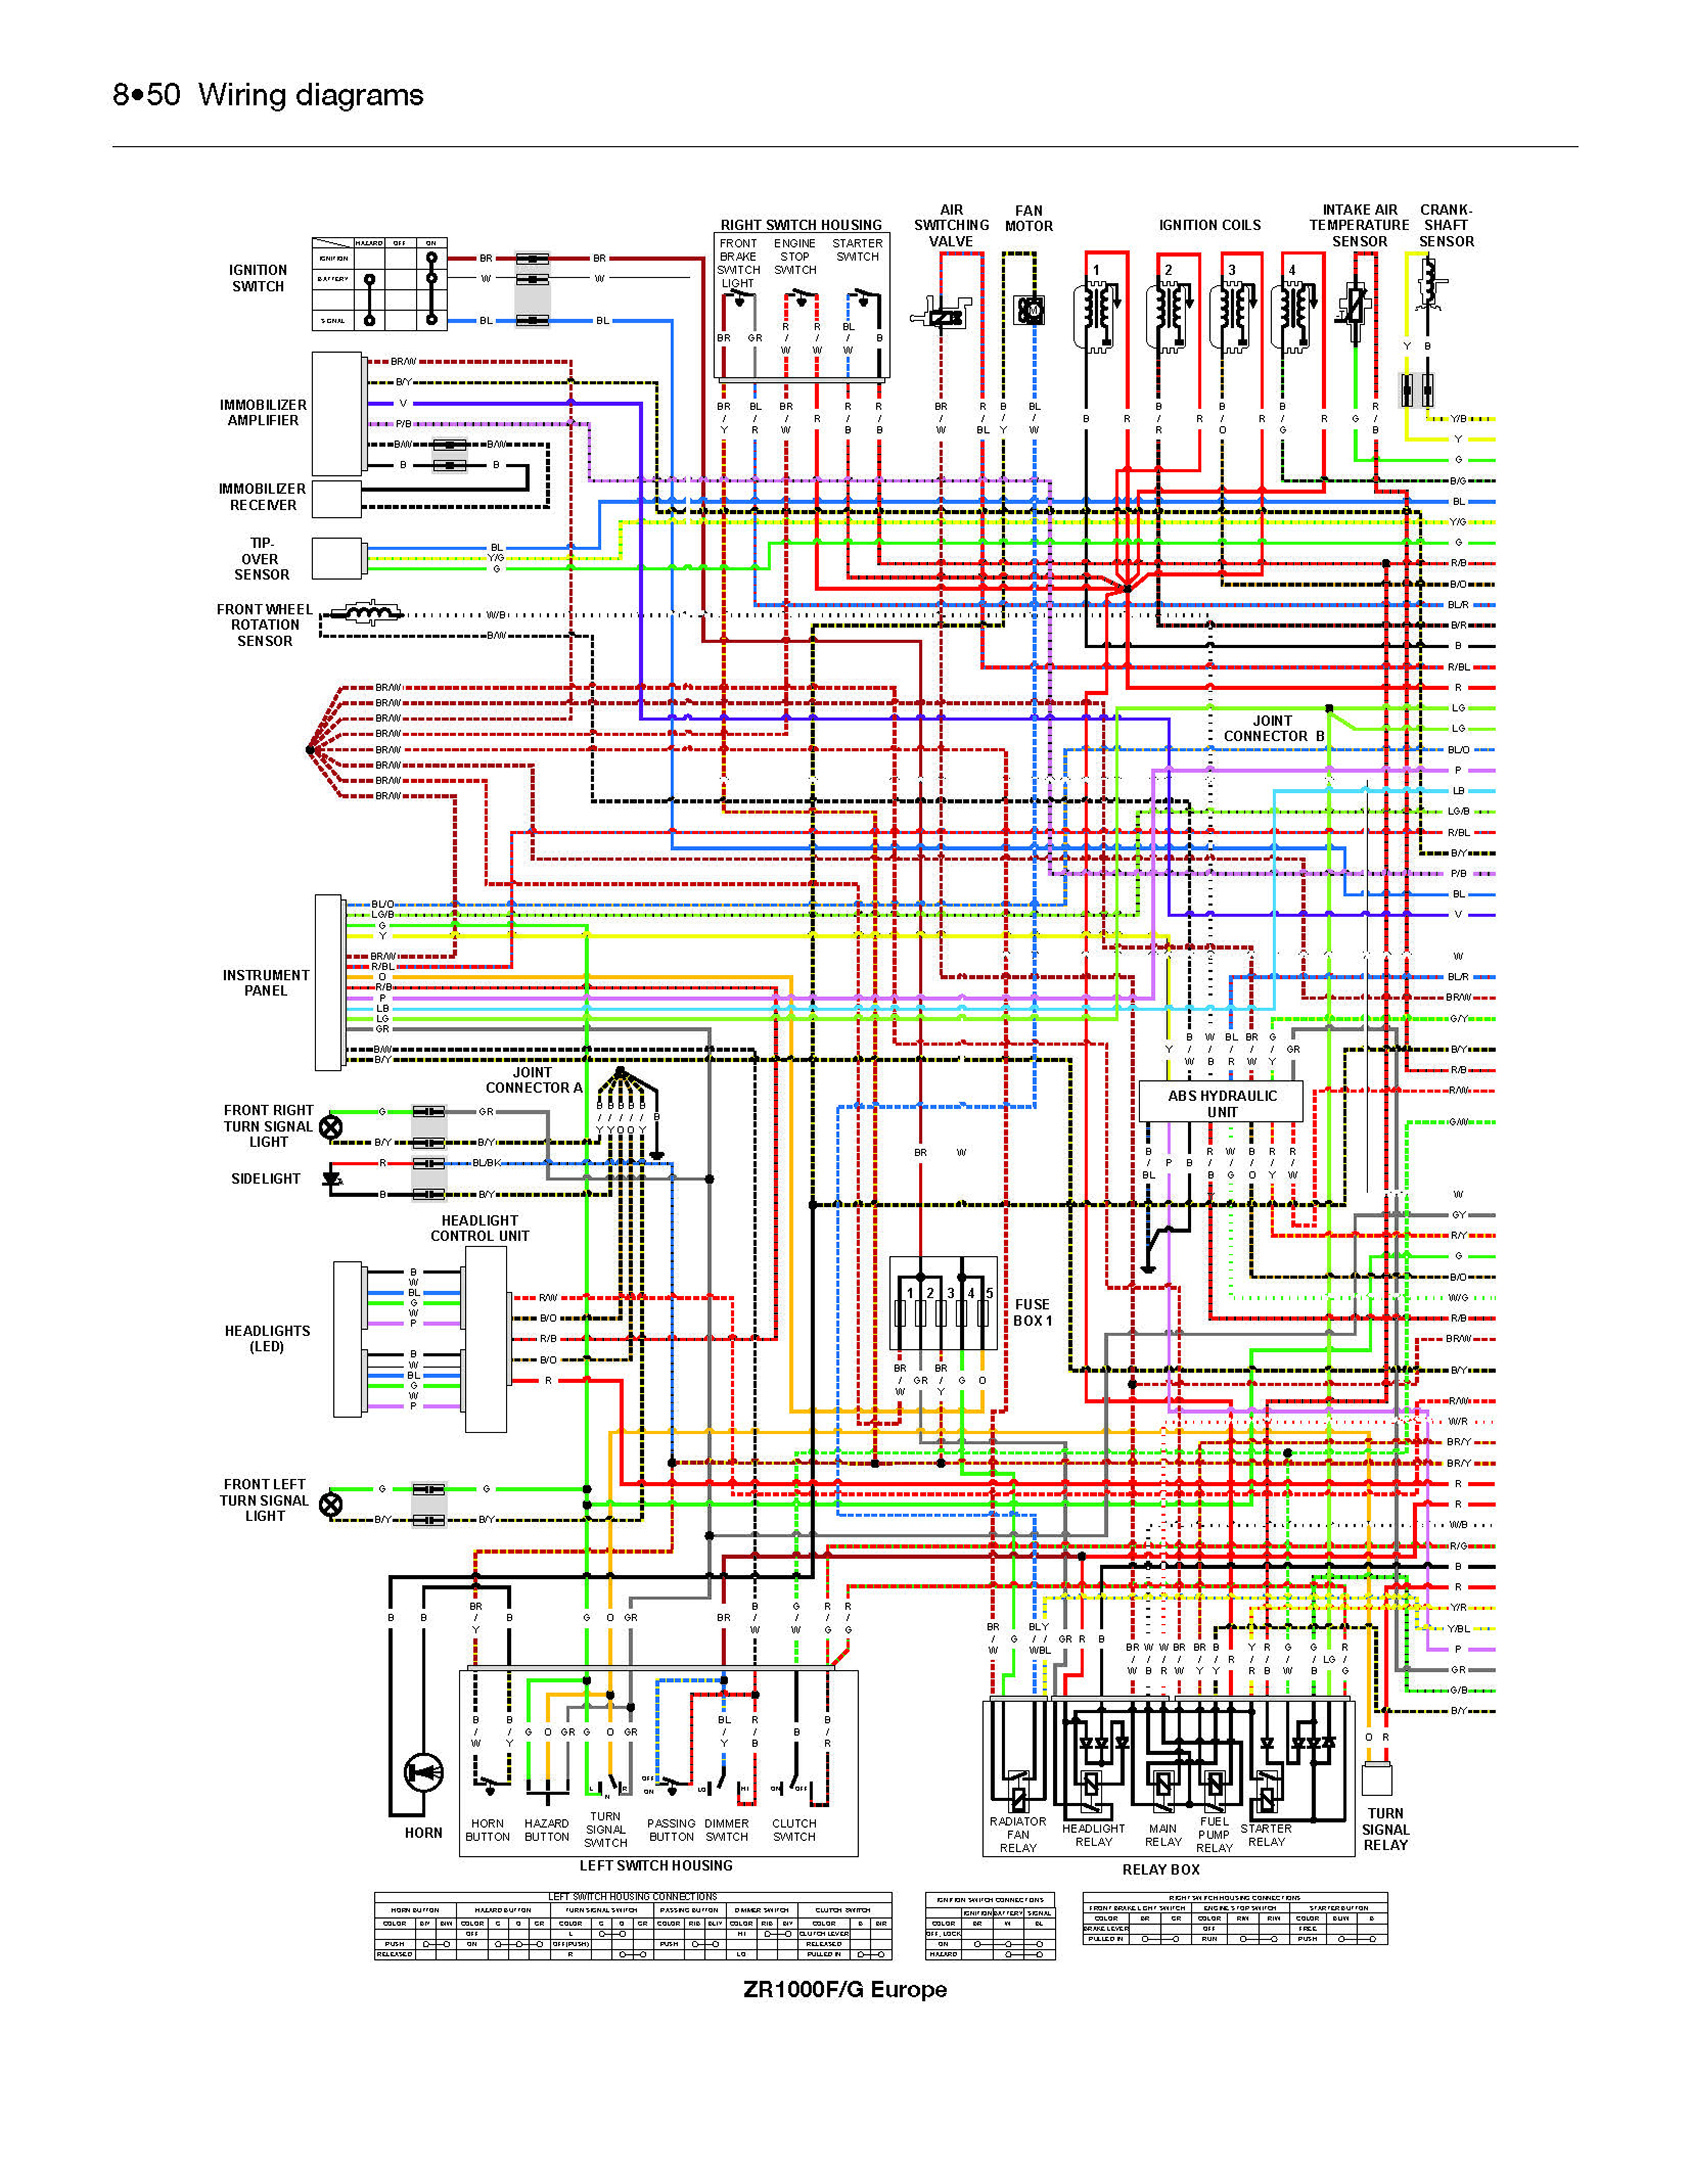 Pleasant Kawasaki Z1000 Wiring Diagram Wiring Diagram Database Wiring Cloud Icalpermsplehendilmohammedshrineorg